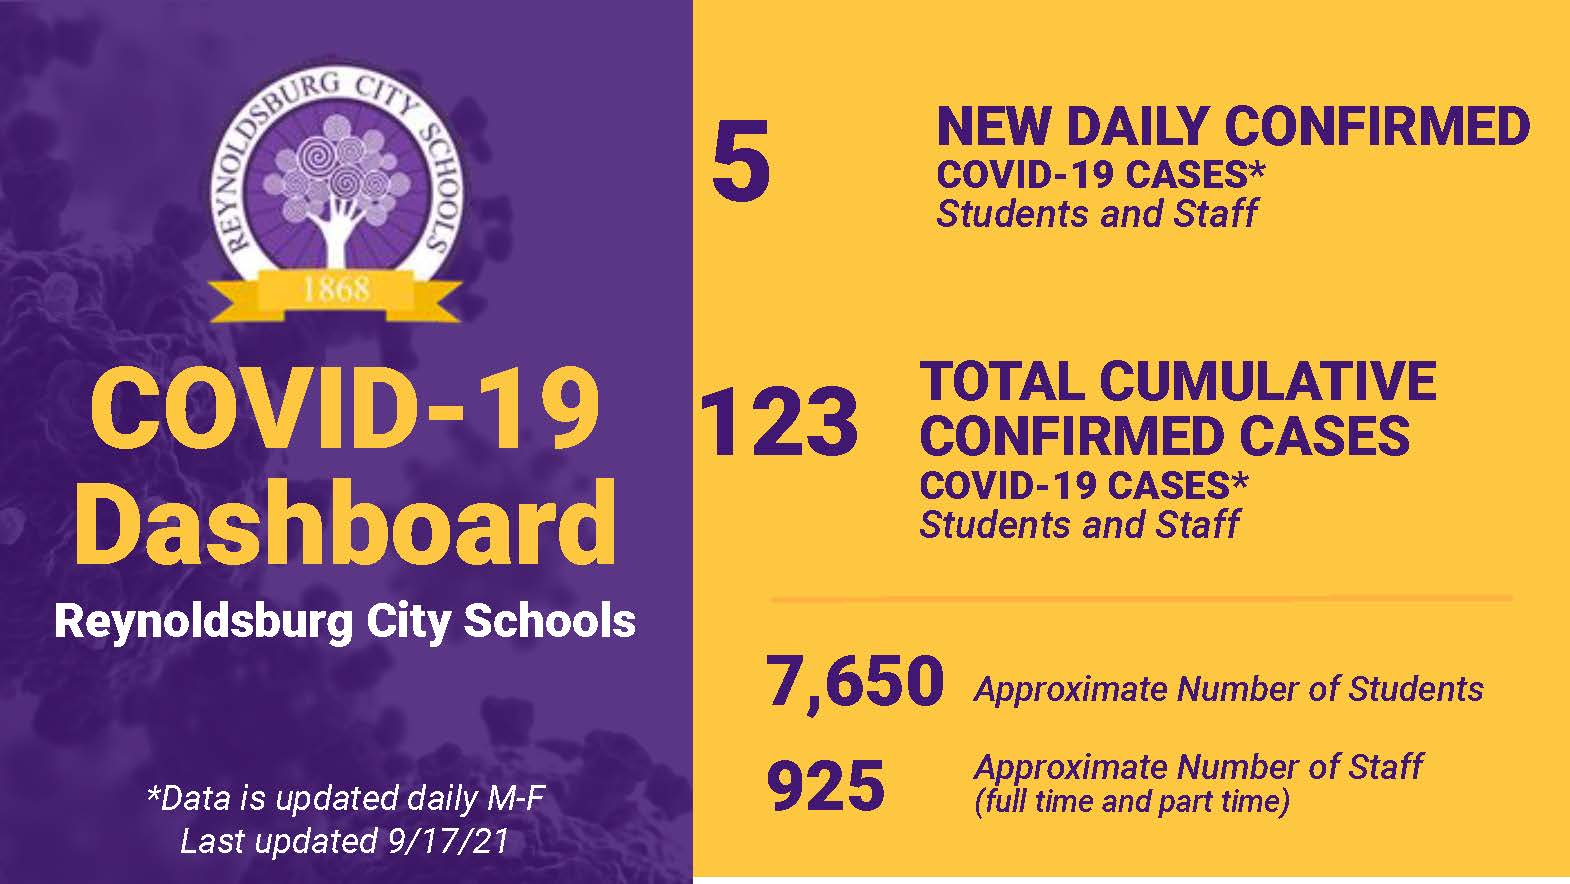 Daily COVID-19 Dashboard